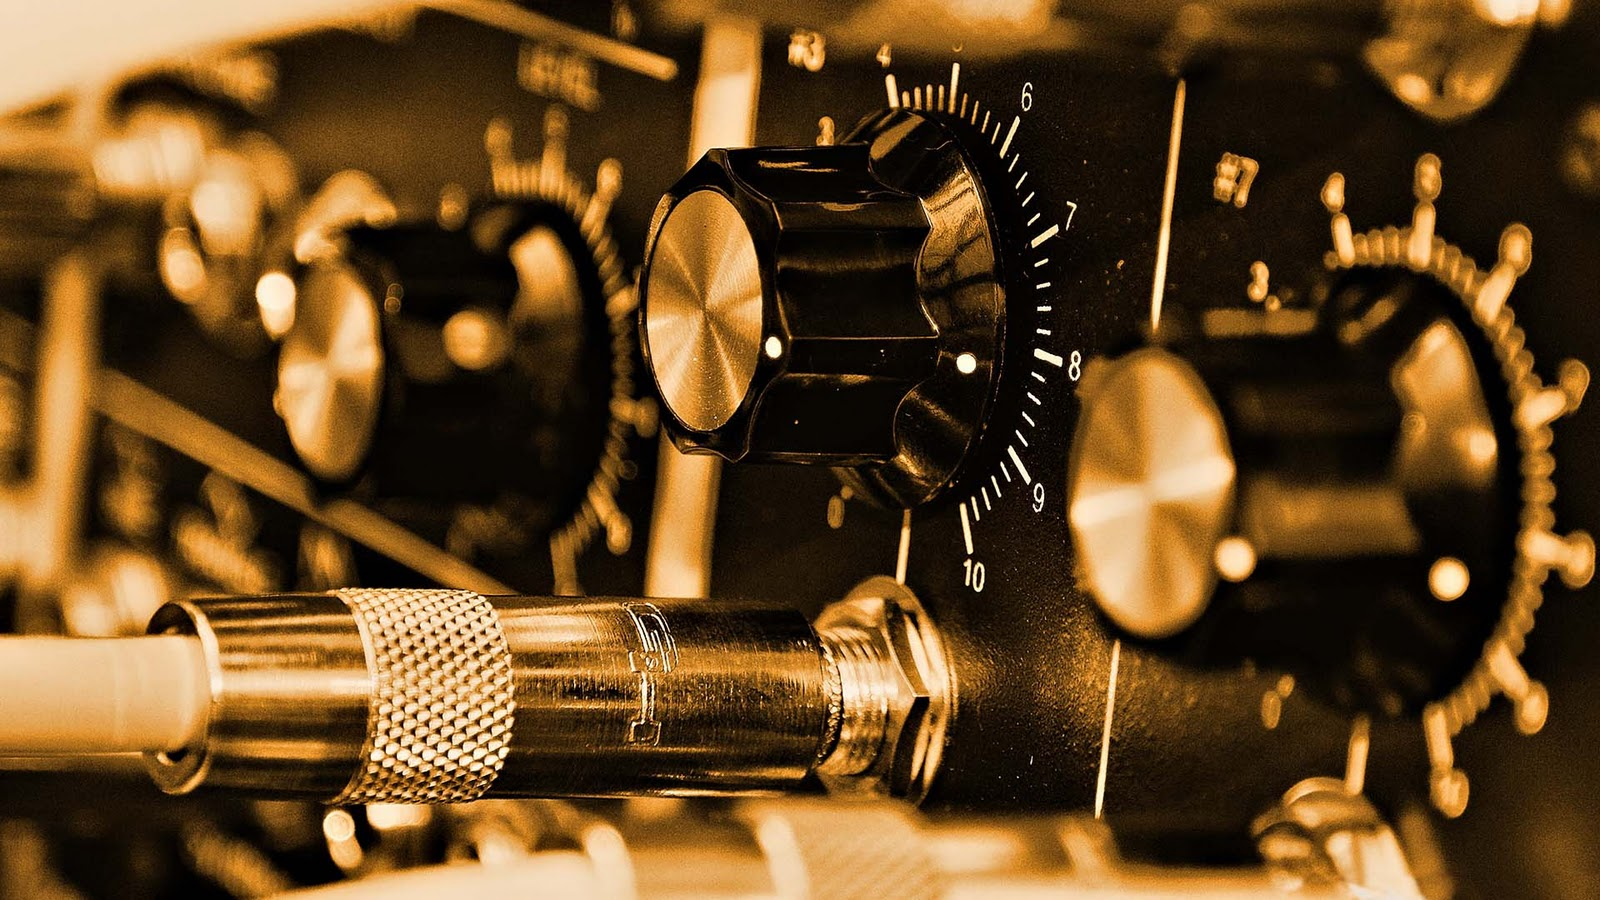 Amplifier Controls Music Desktop